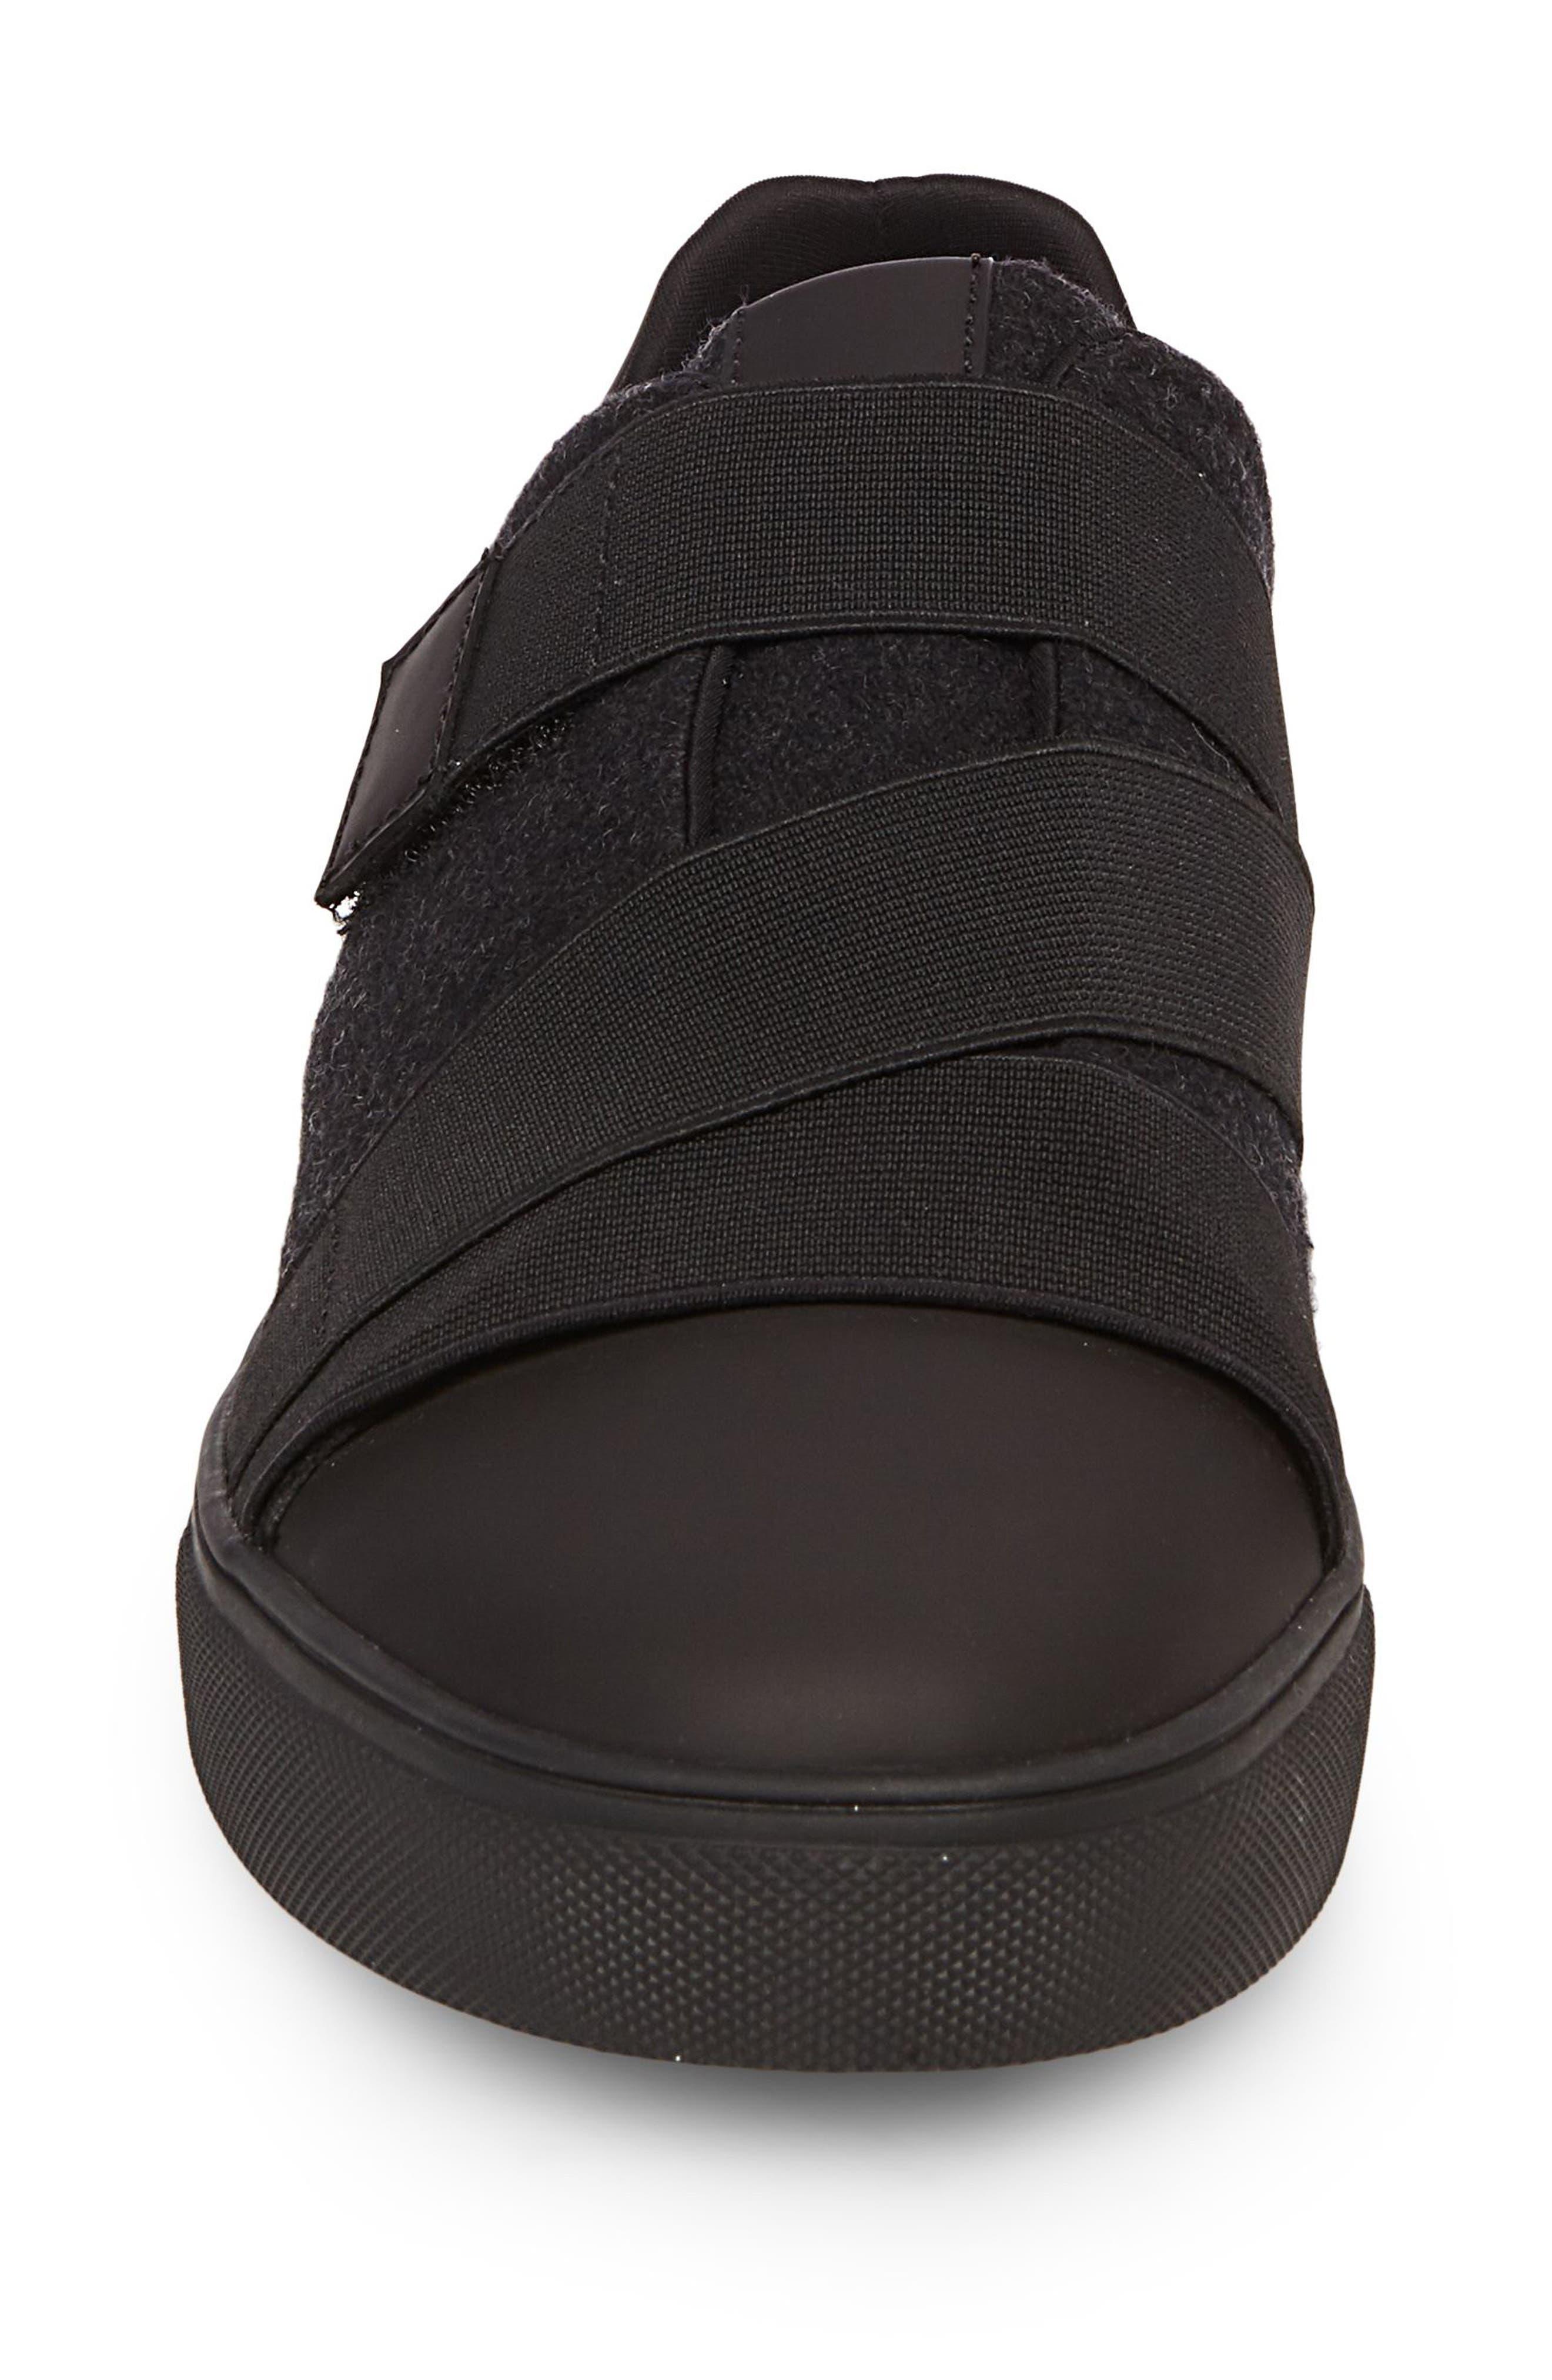 Westy Sneaker,                             Alternate thumbnail 4, color,                             Black